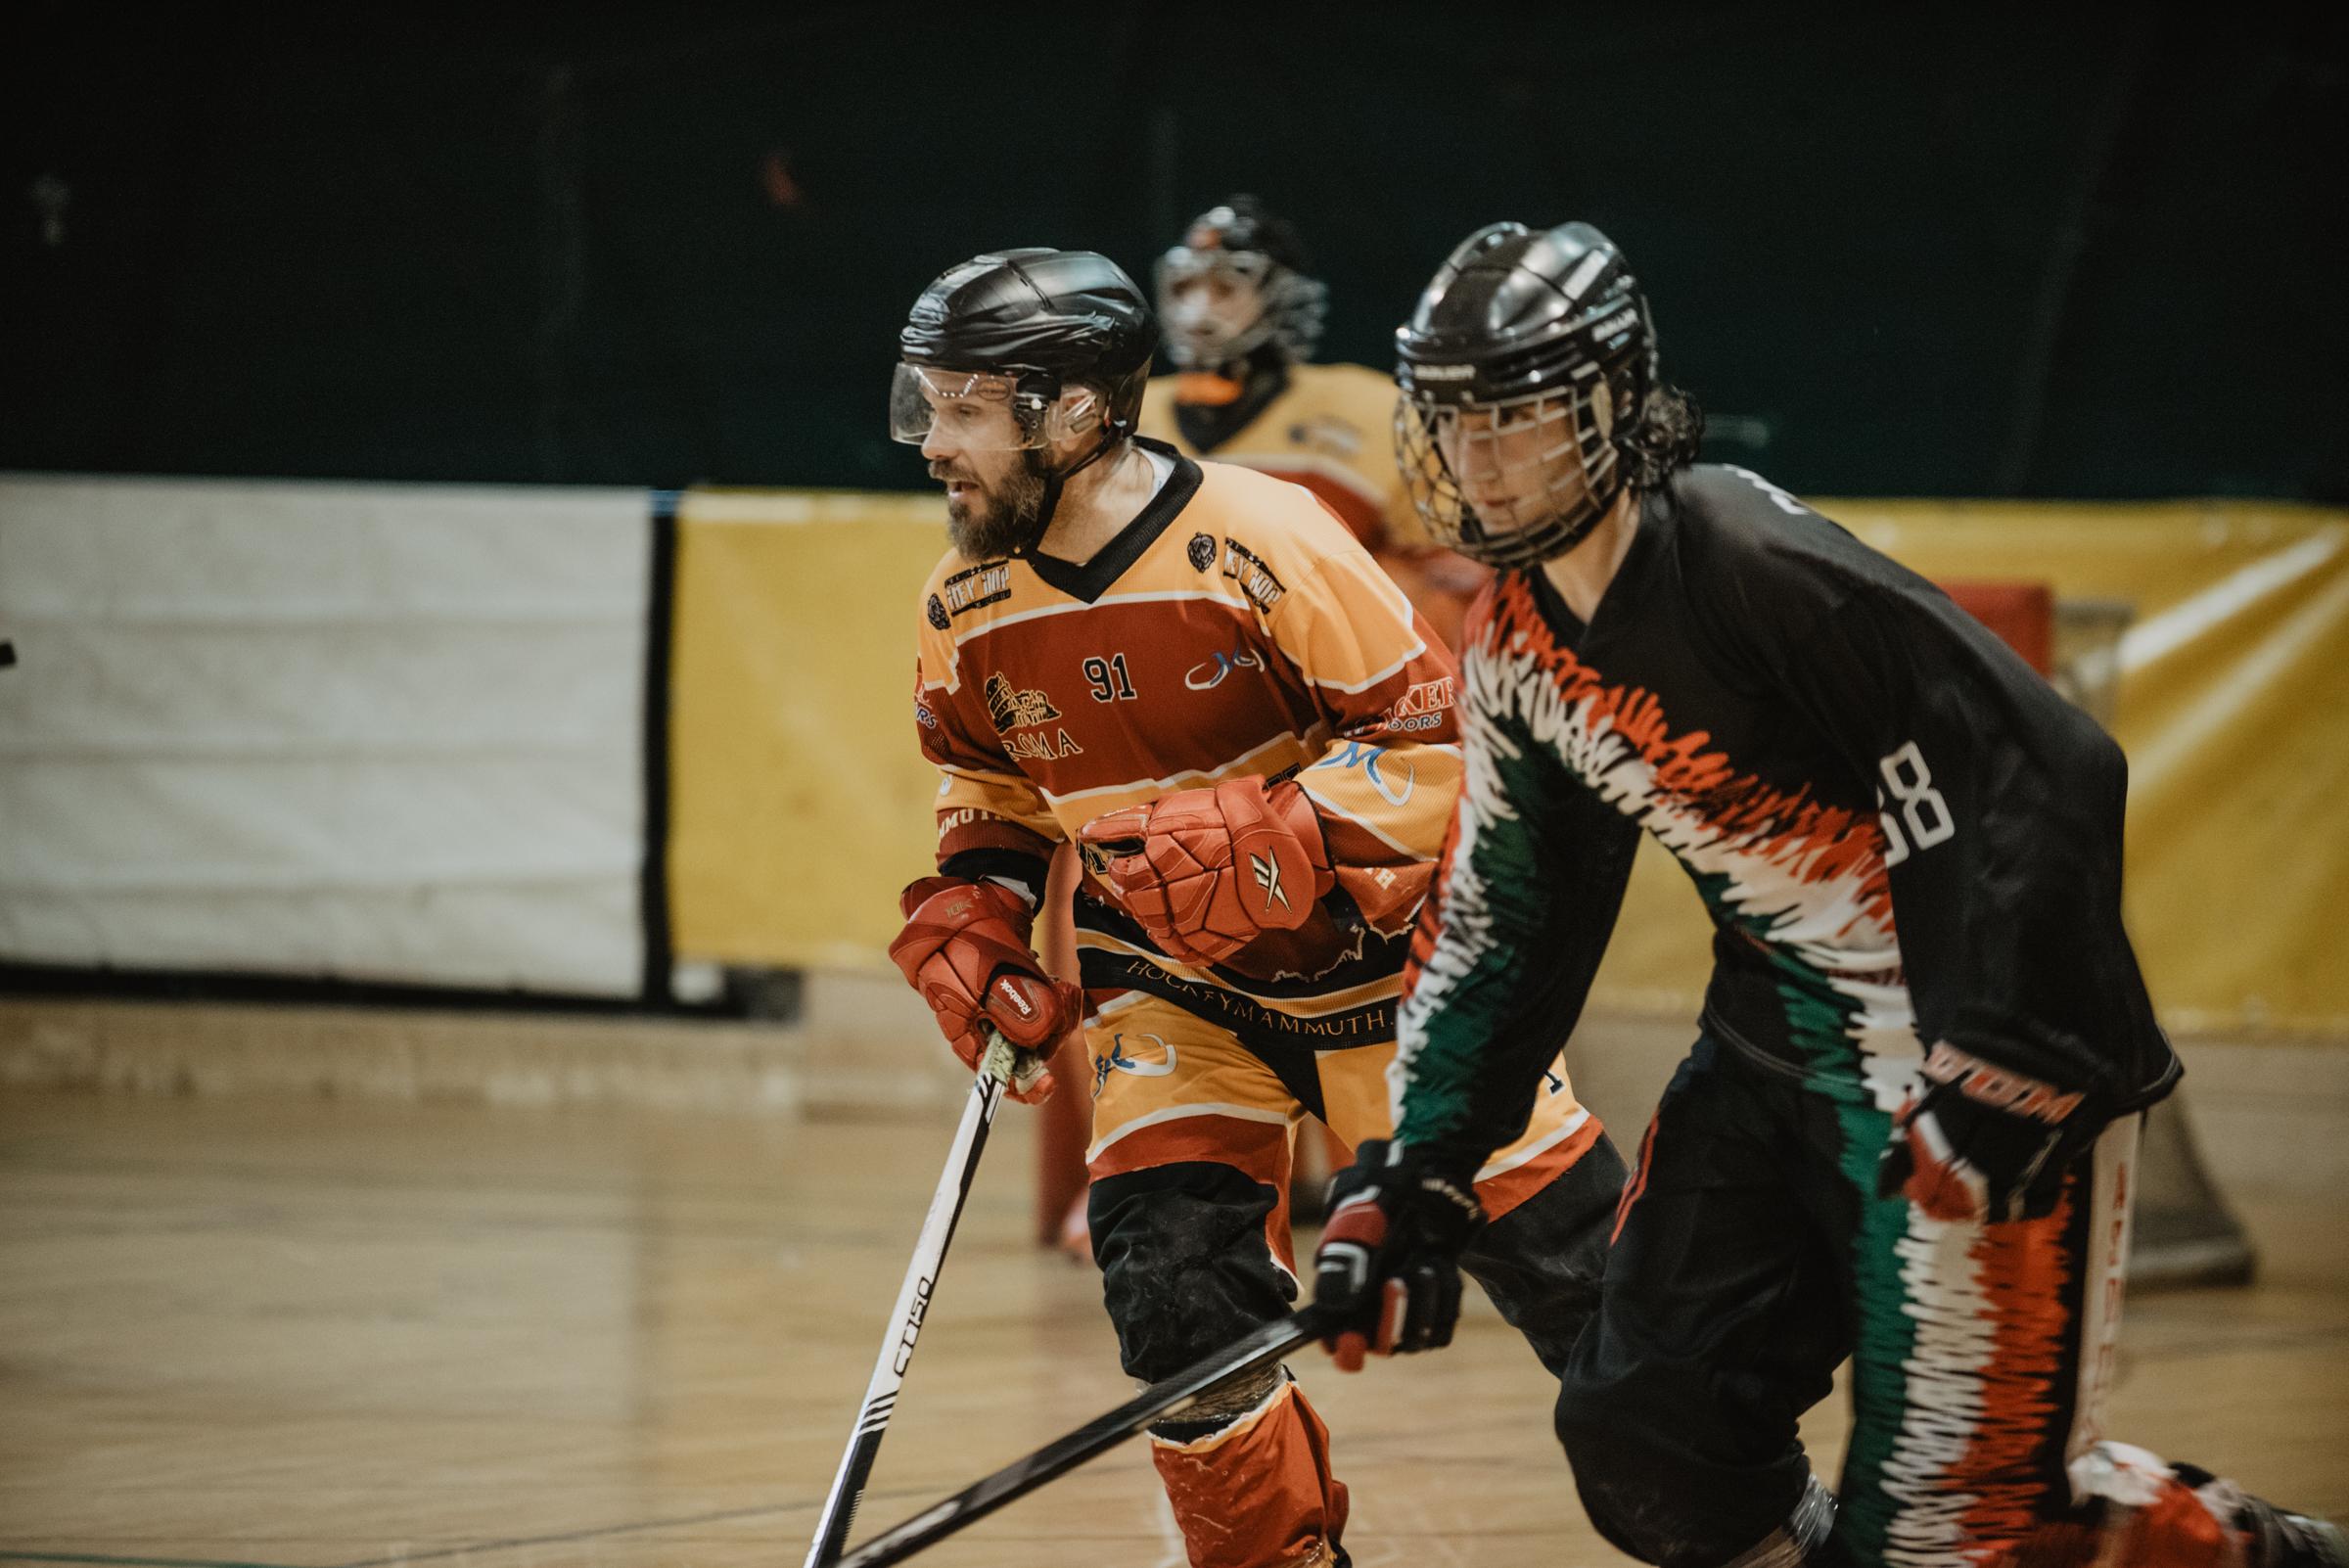 hockey roma, inline hockey roma, mammuth hockey, mammuth roma, rita foldi photography, sports photography, firs, campionato FISR, campionato serie B